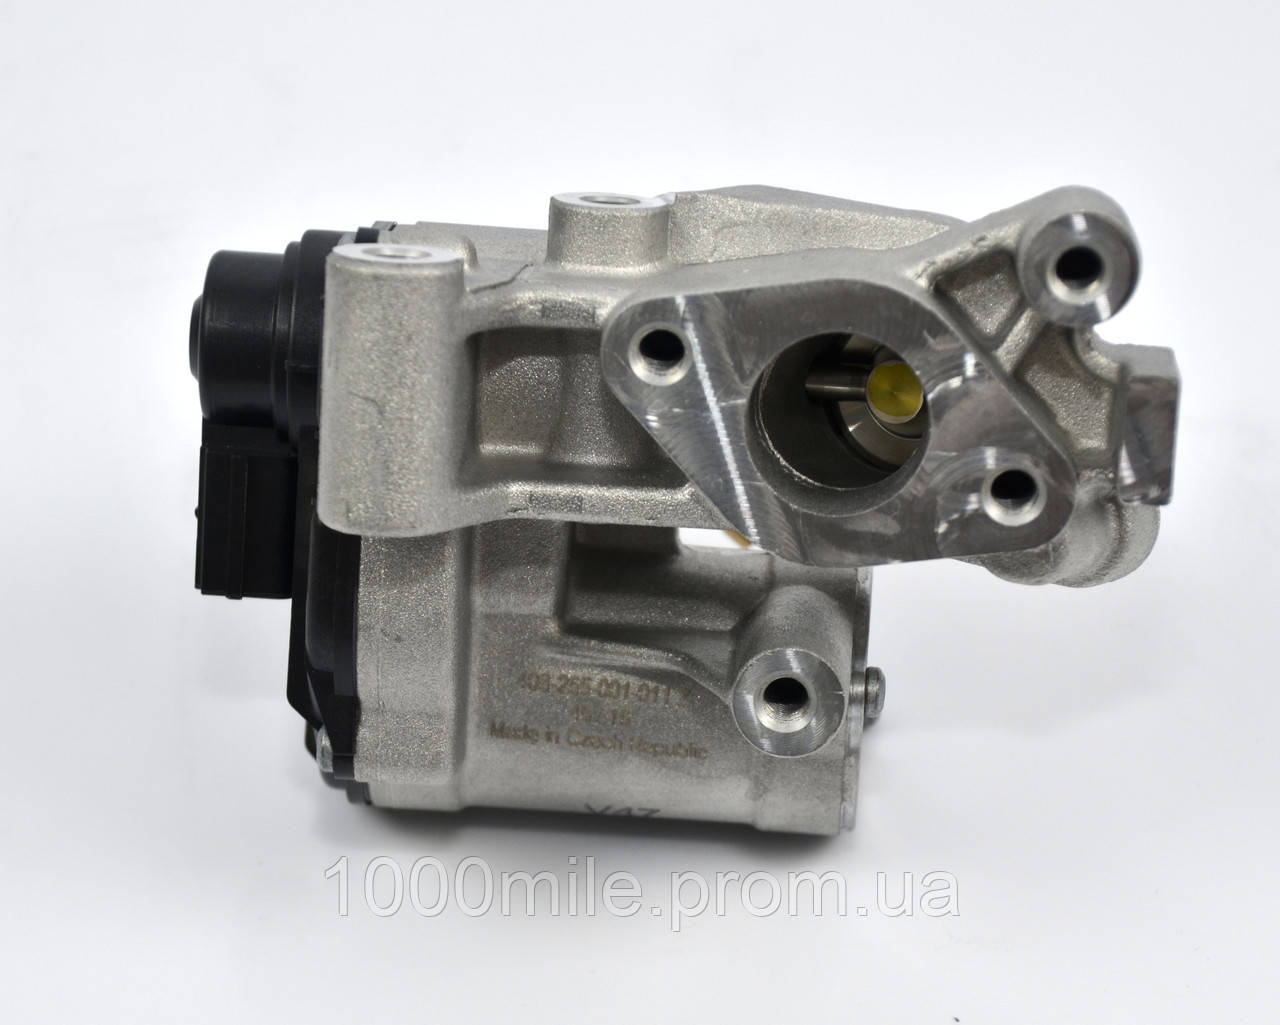 Клапан EGR на Renault Master II 2003->2010, 3.0dCi  —  SIEMENS VDO (Германия) - 408-265-001-011Z